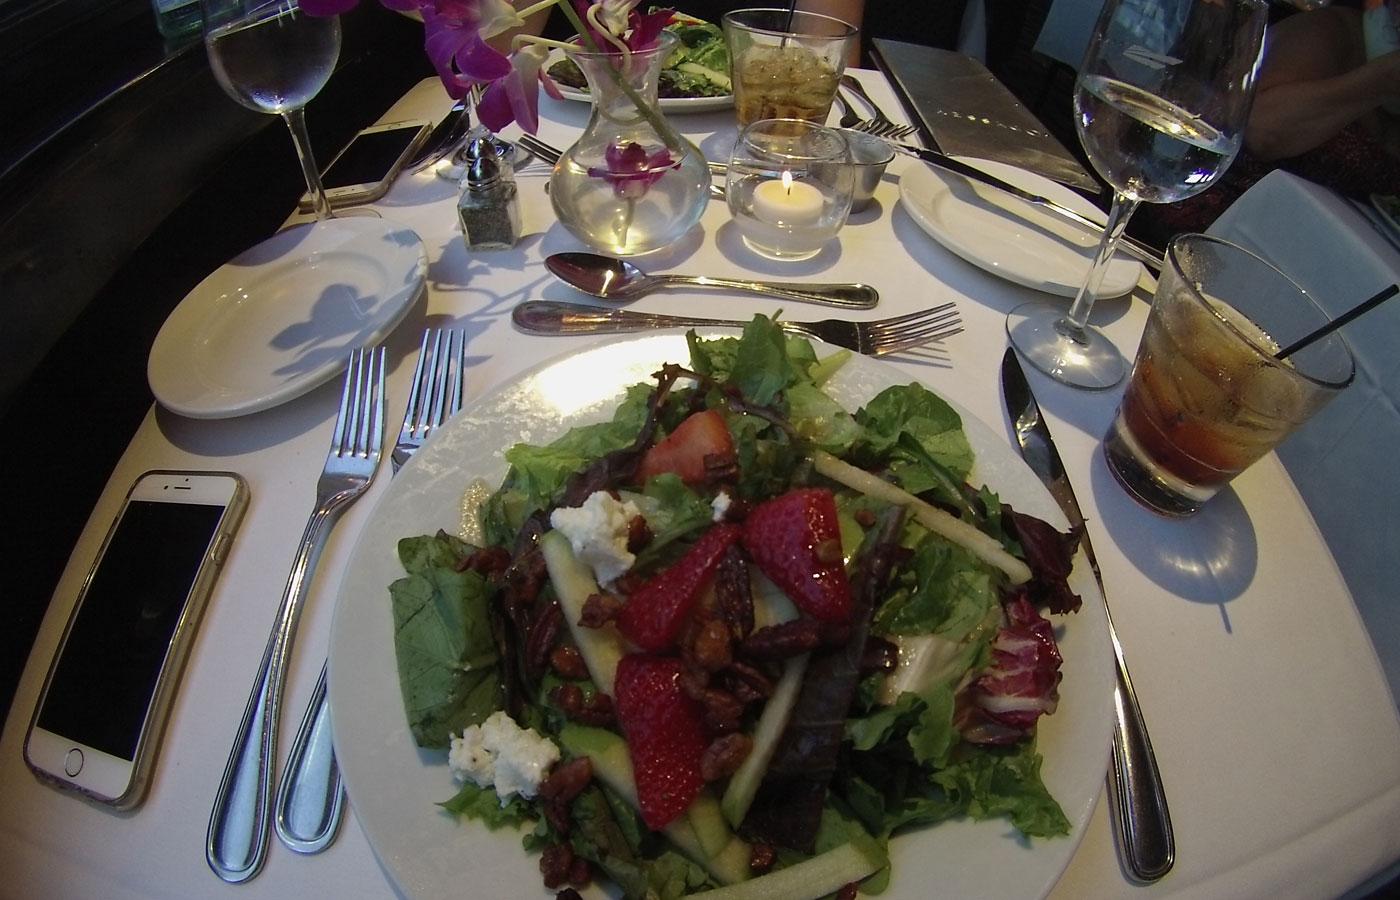 odyssey-cruise-food